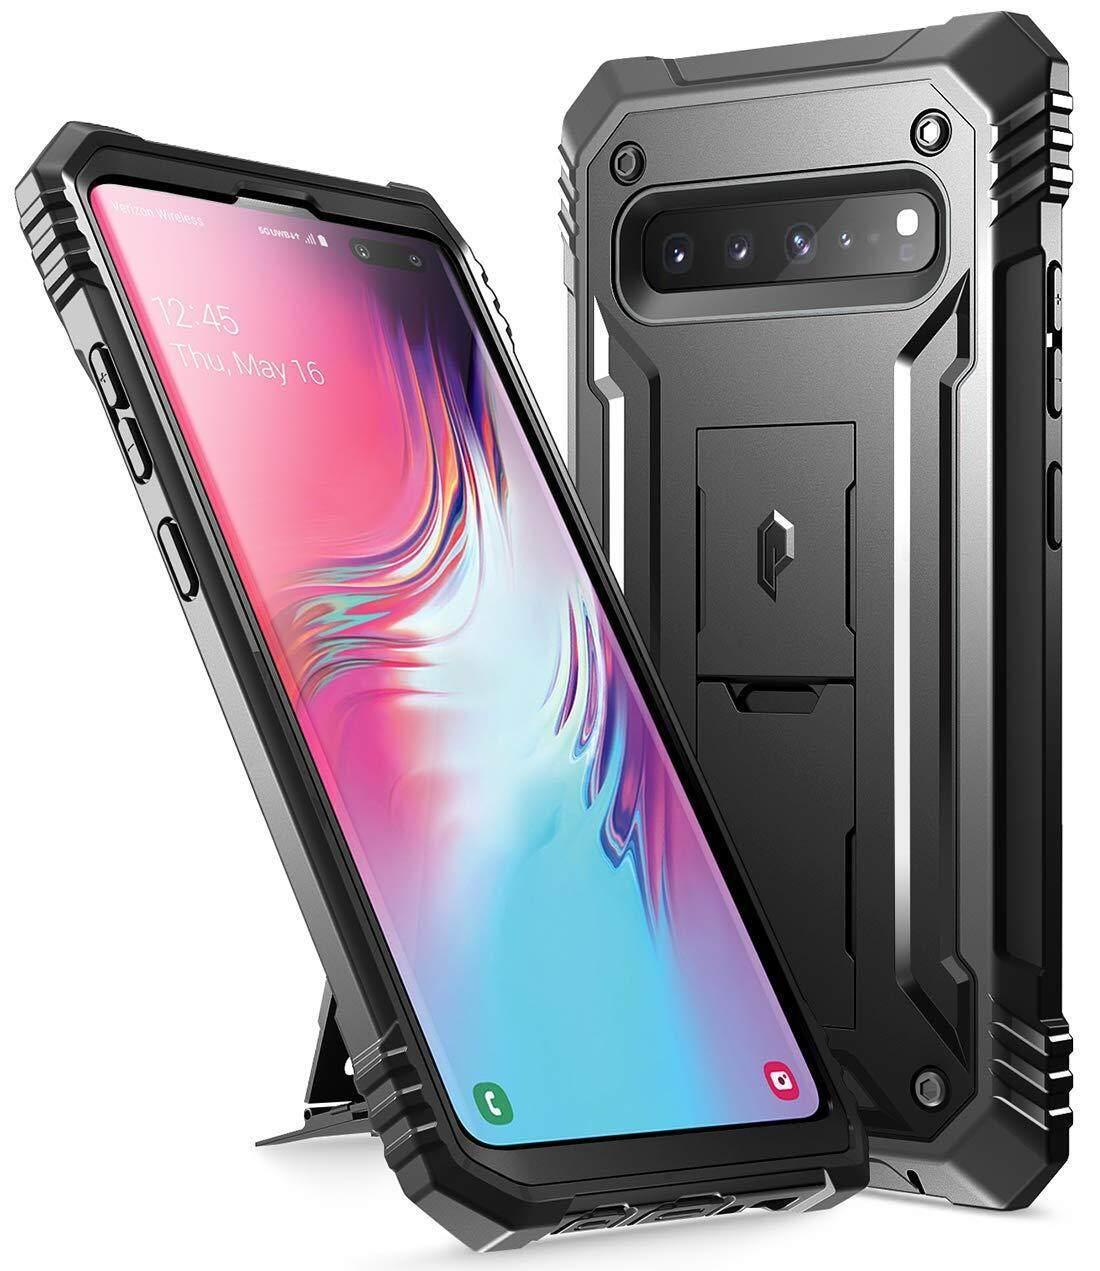 Galaxy S10 5G Kasar Case dengan Kickstand Puitis Tubuh Penuh Dual-Layer Pelapis Pelindung Tahan Goncang, tanpa Built-In-Pelindung Layar, Revolusi, untuk Samsung Galaxy S10 5G 6.7 Inch (2019)